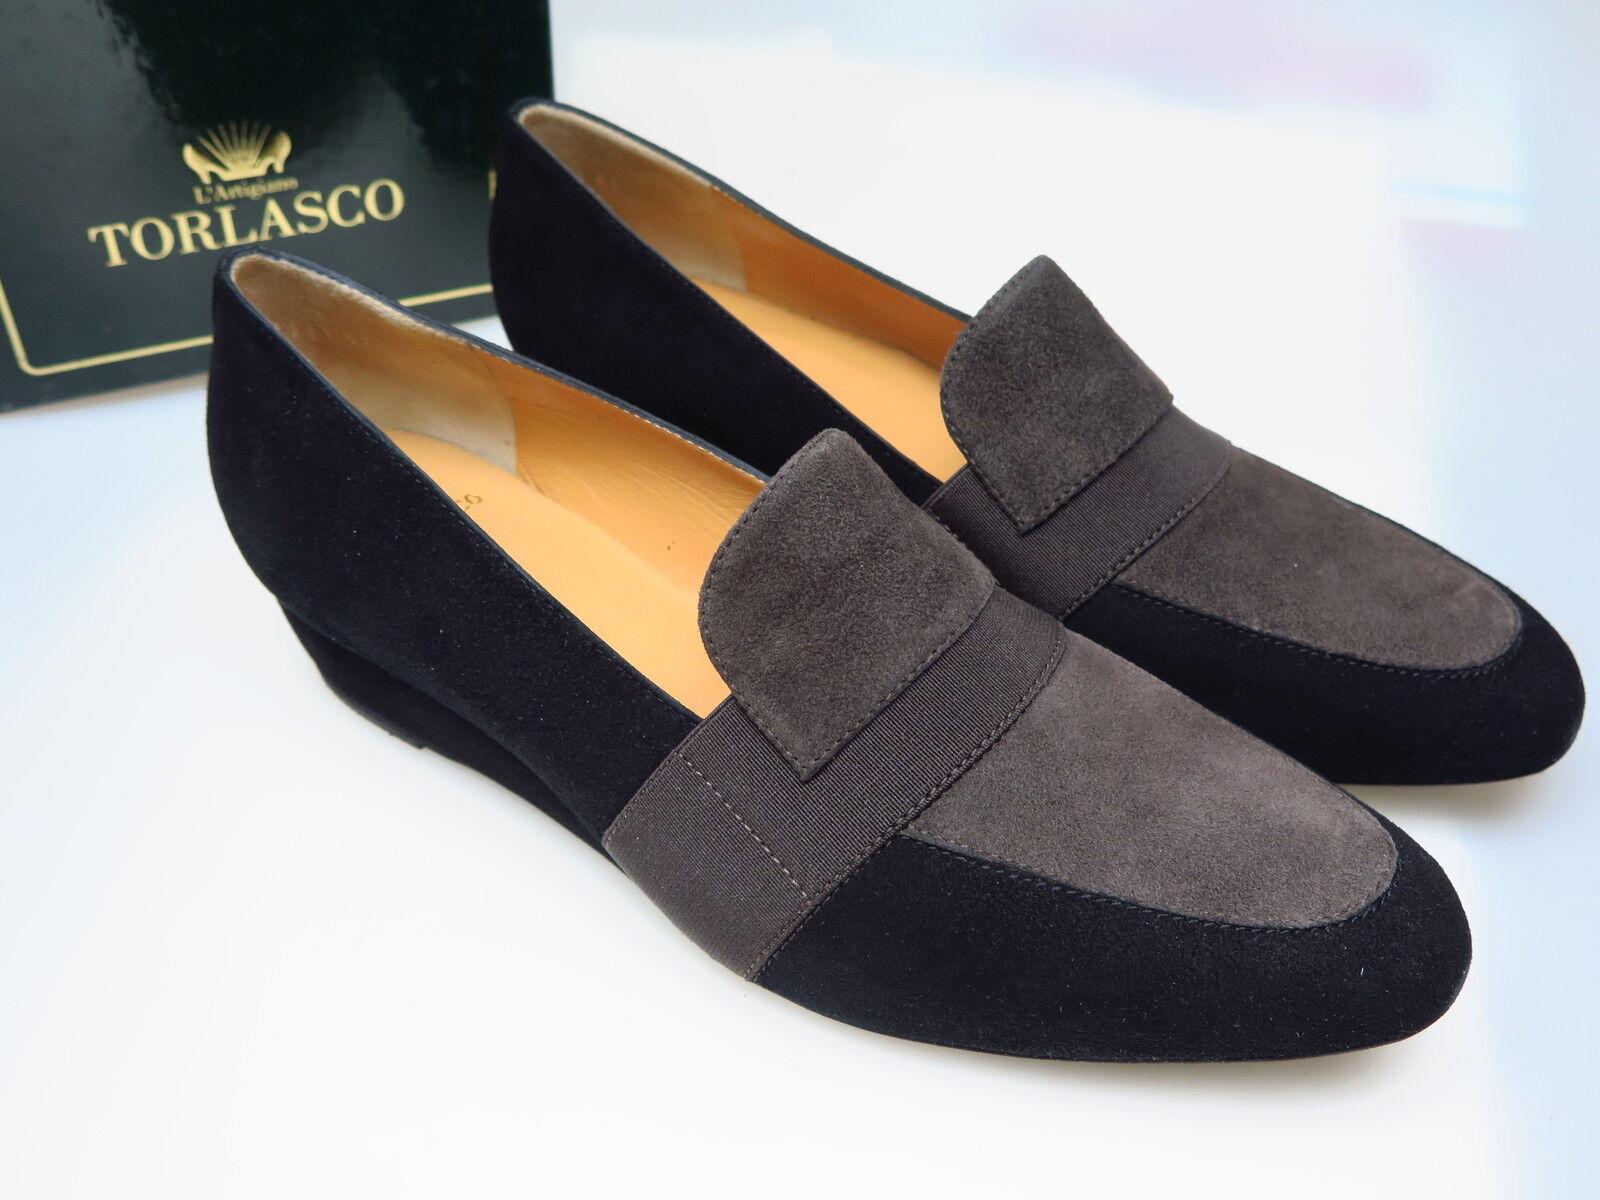 Torlasco zapatos señora de diseño zapatos 11111dr30 Londra rennanera talla 41 nuevo